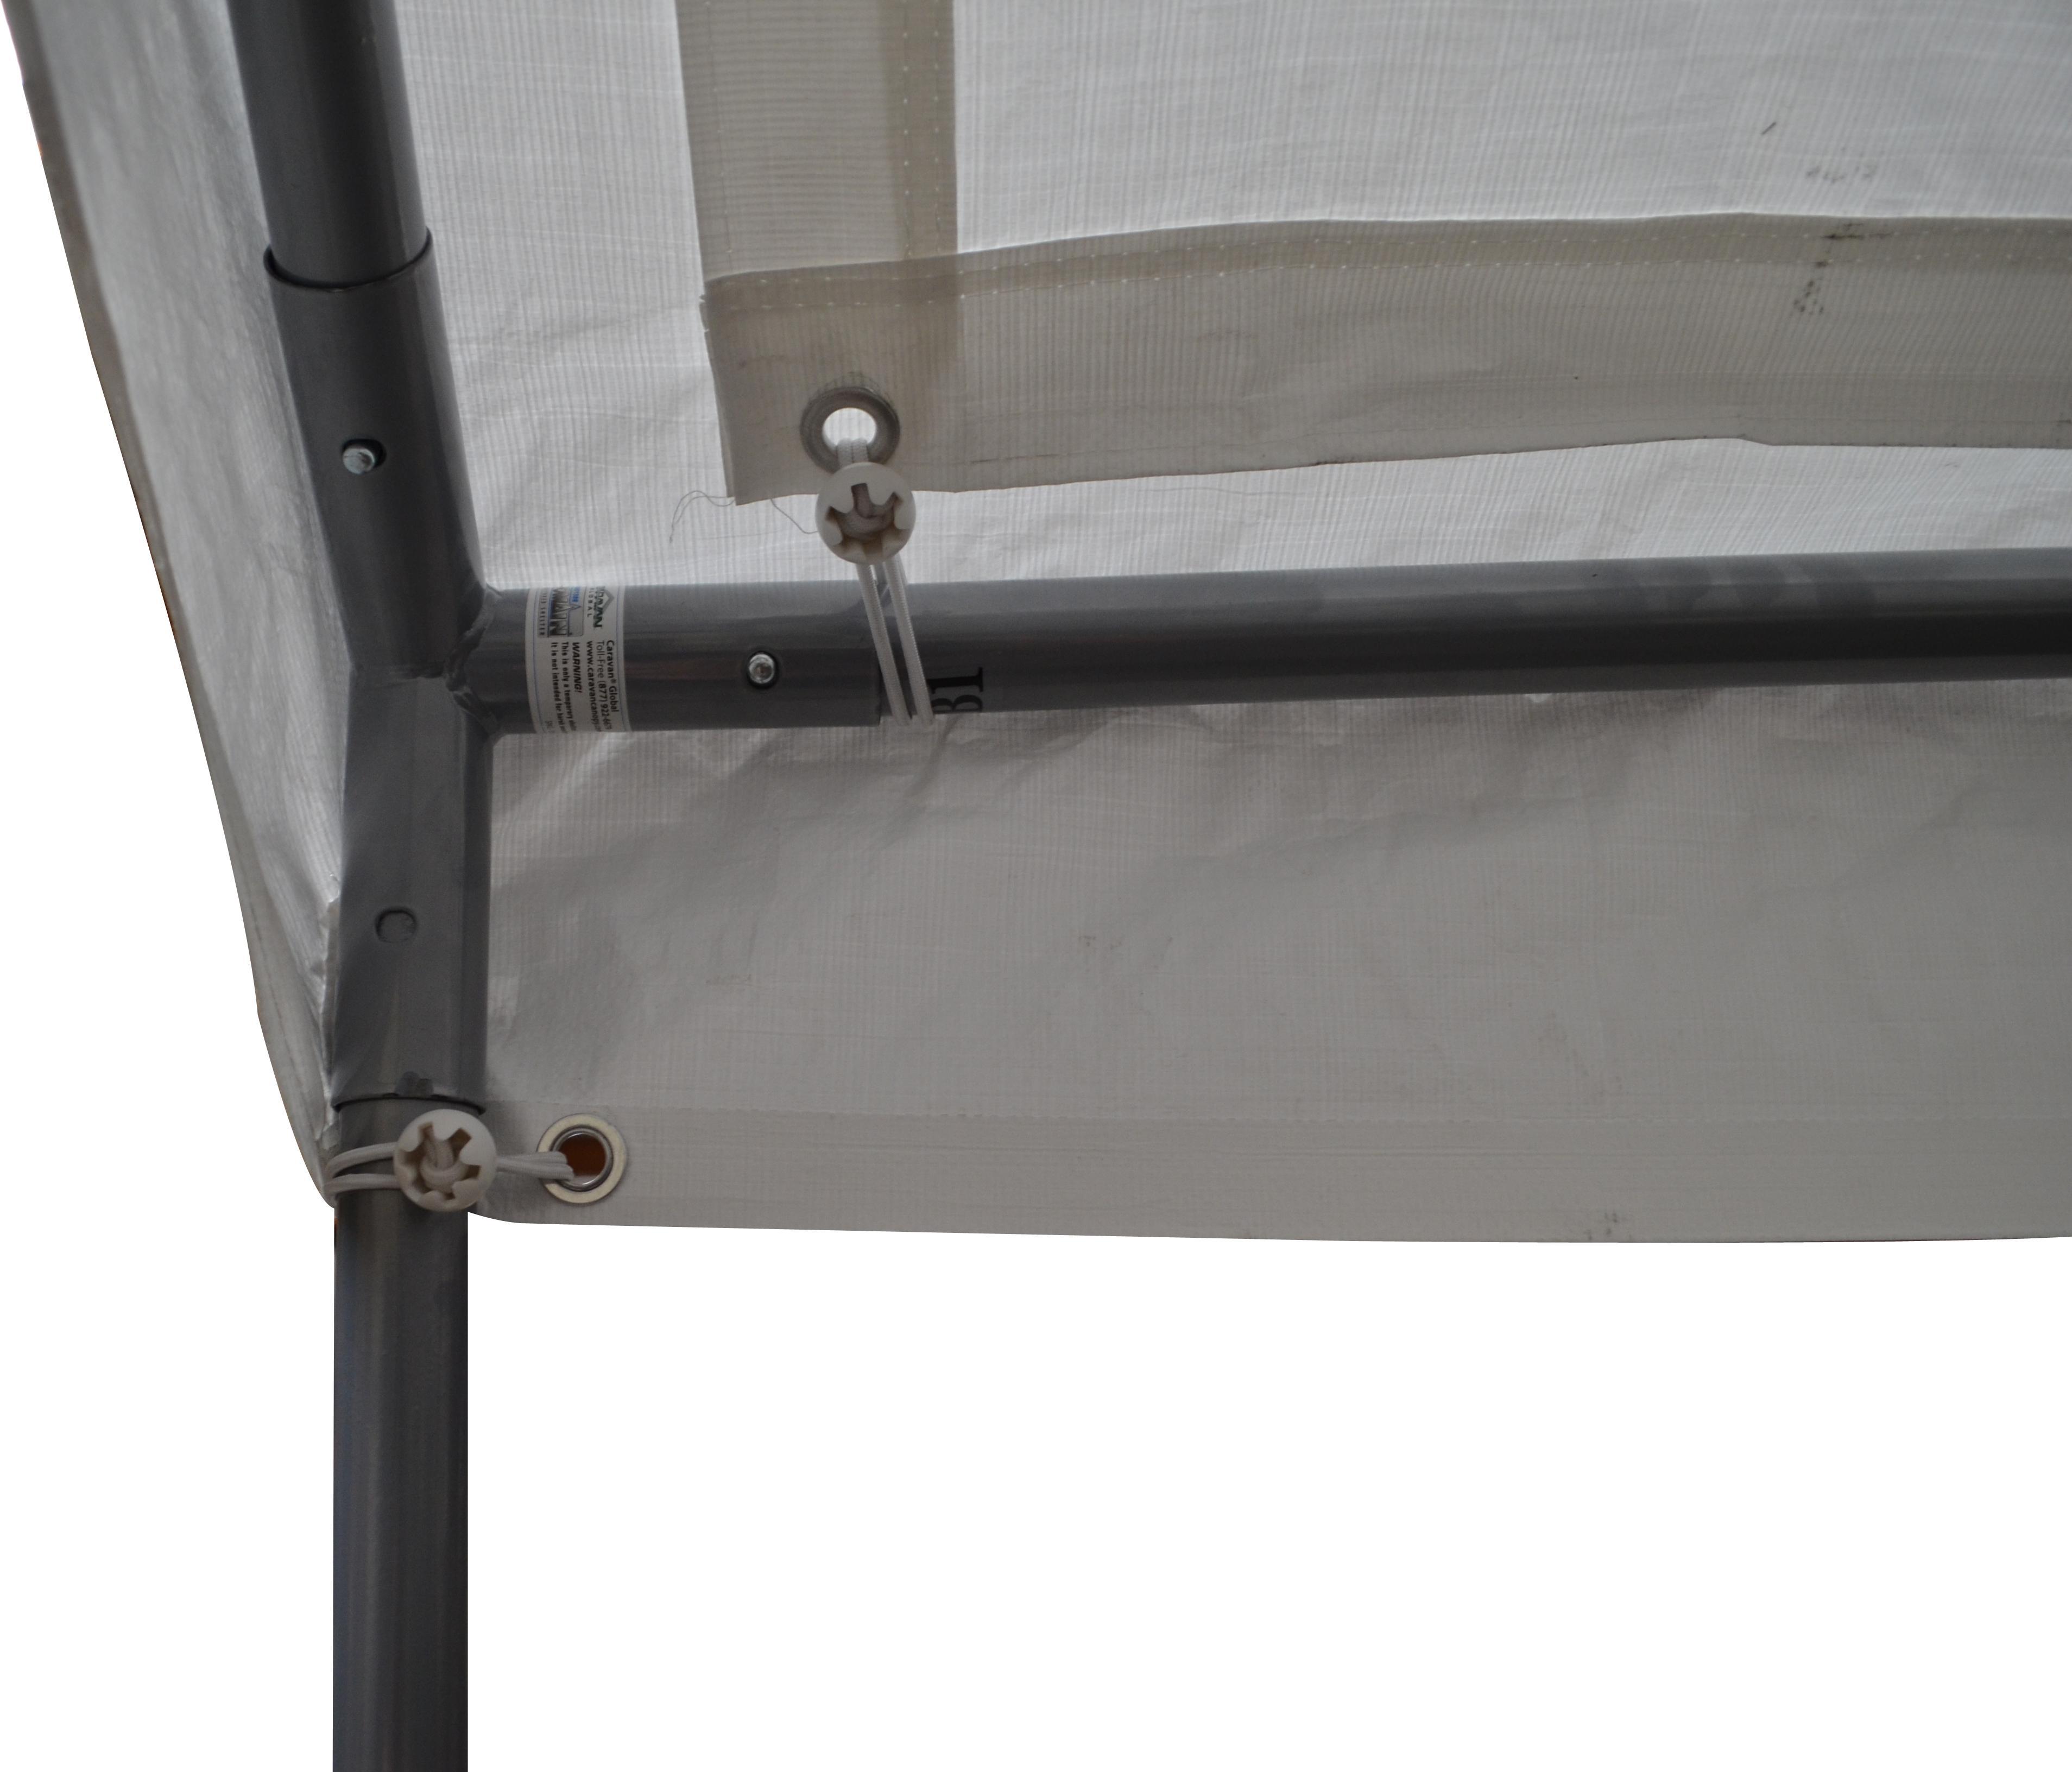 Auger Anchors For Carports : Caravan canopy feet domain carport white amazon